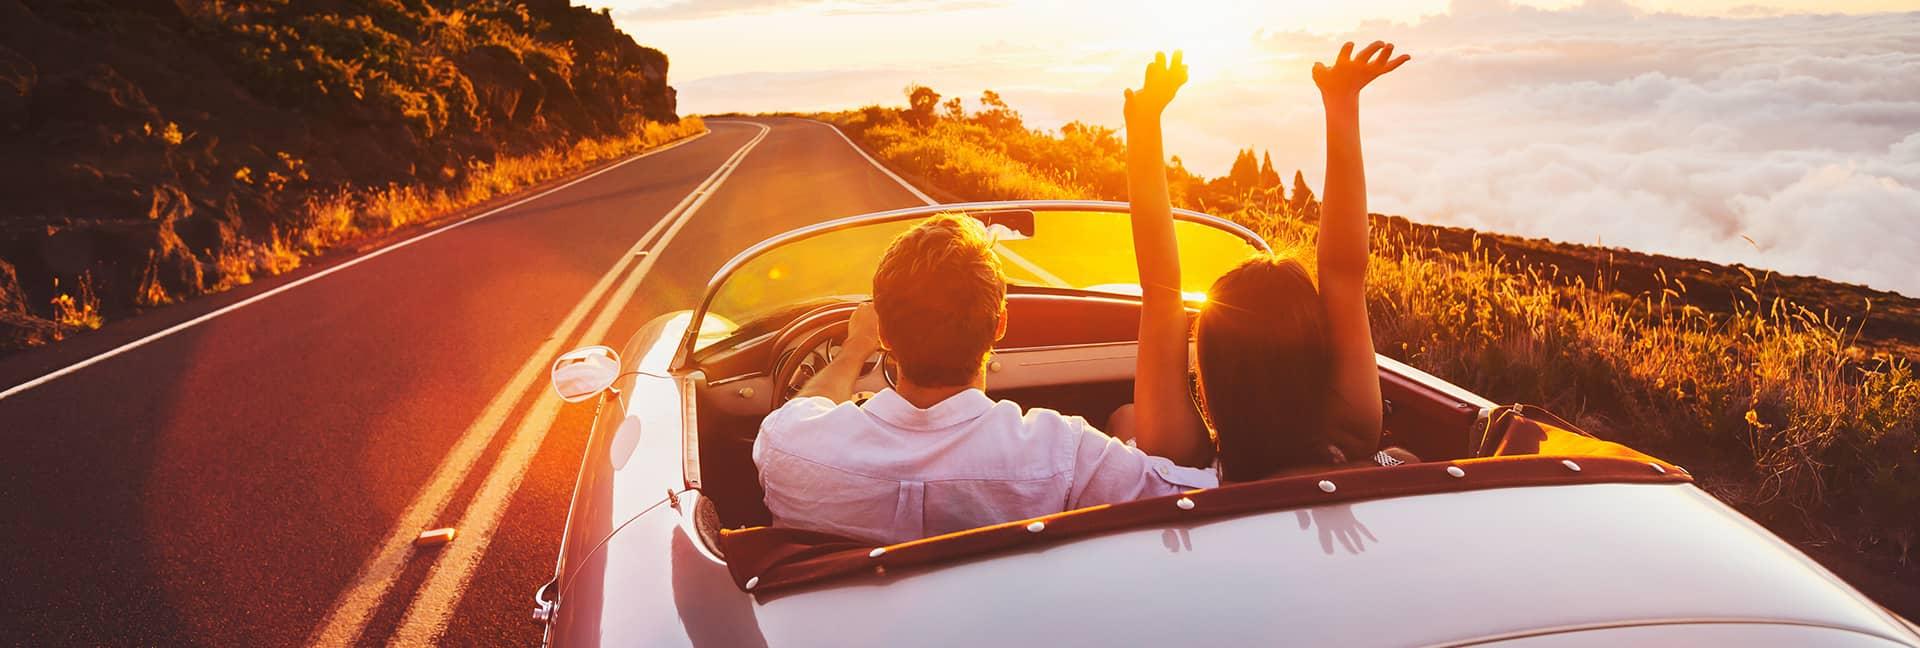 Header Projekt Multipart Auto Garantie